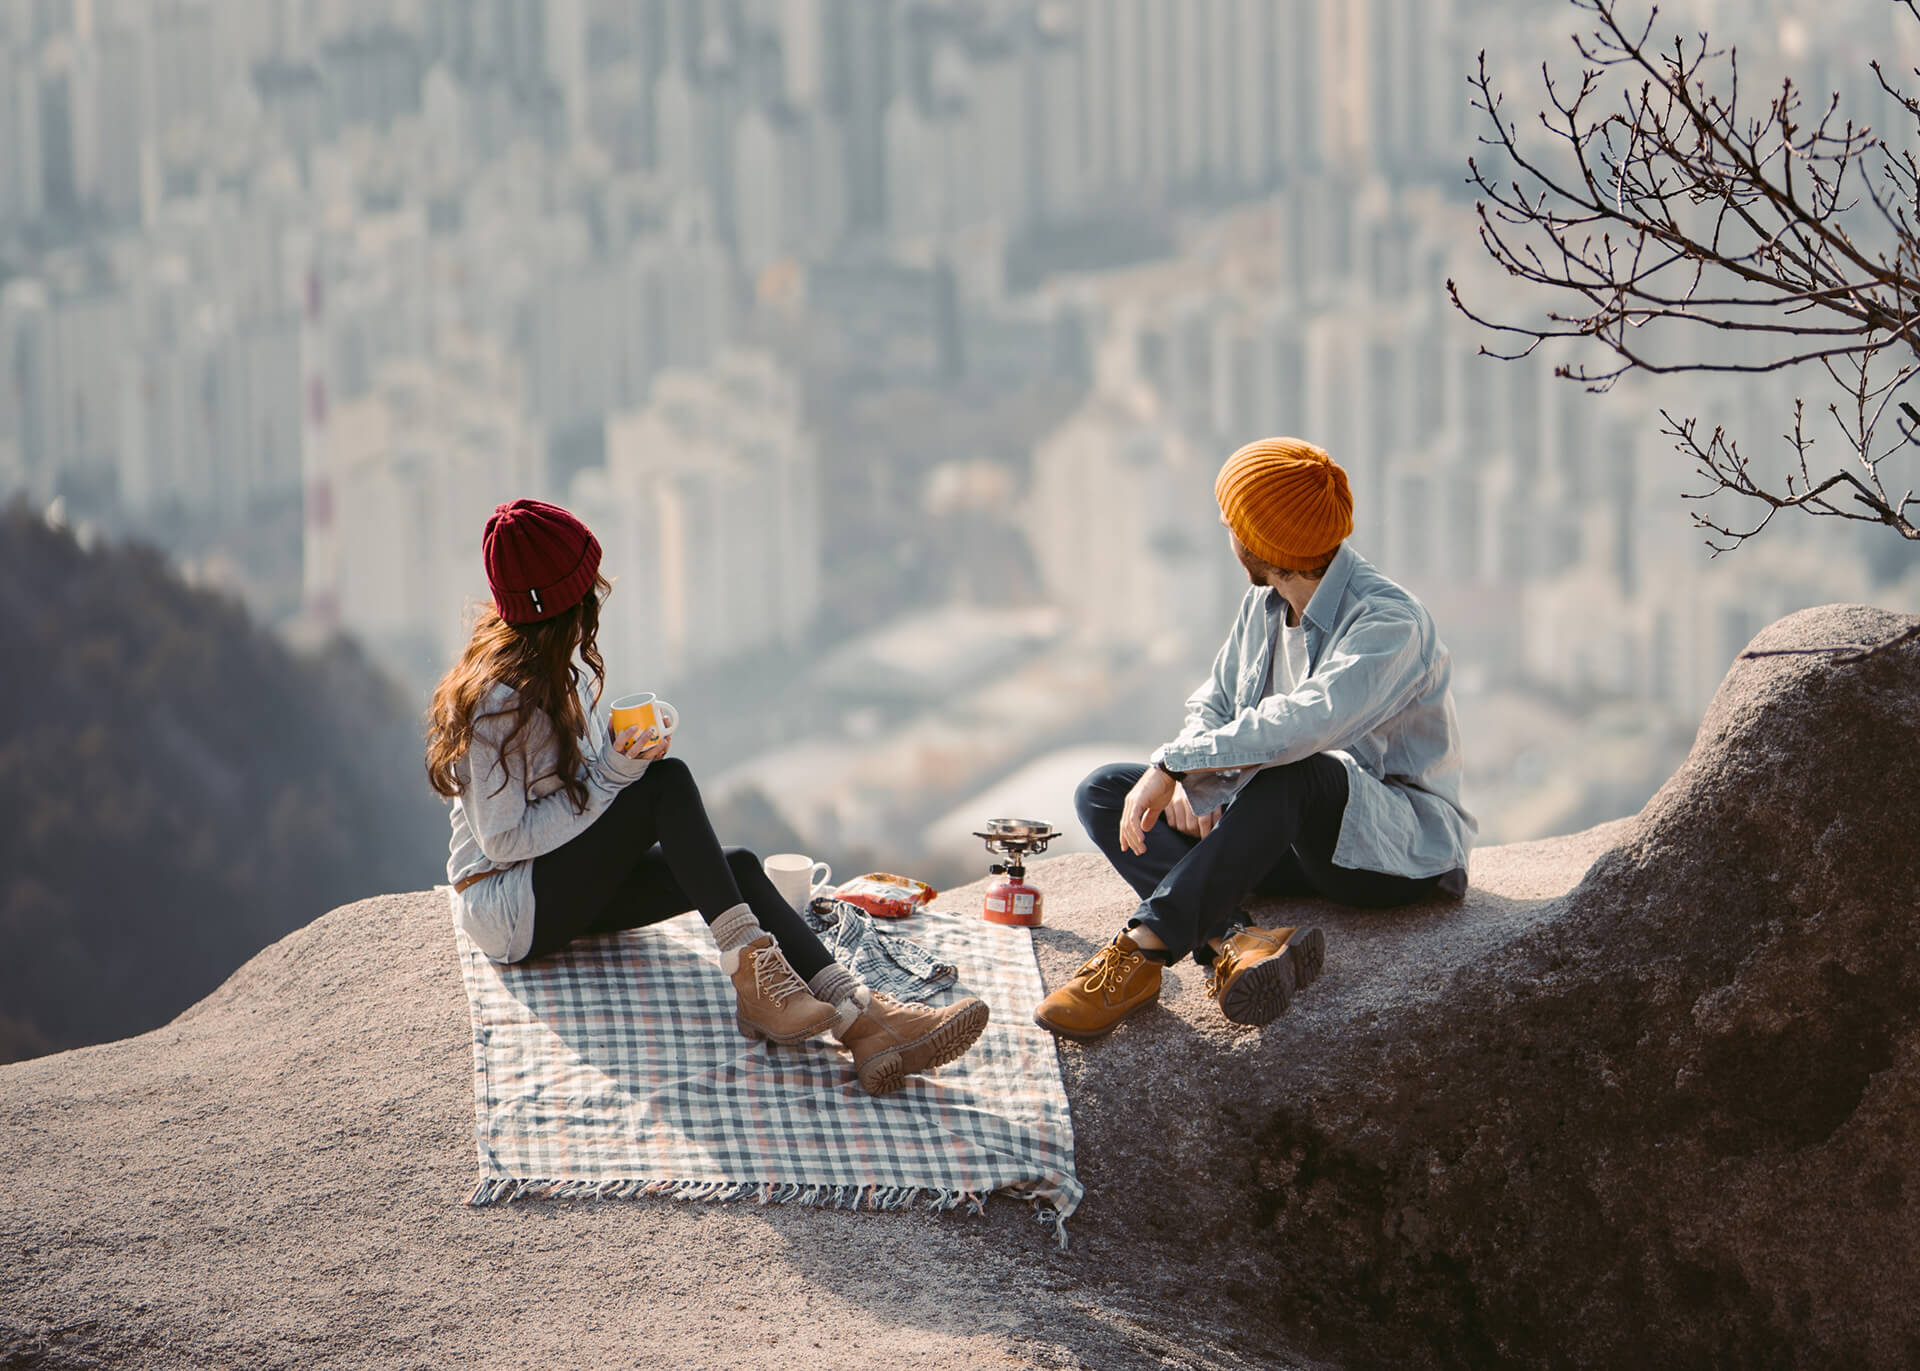 romantic picnic date ideas outdoors